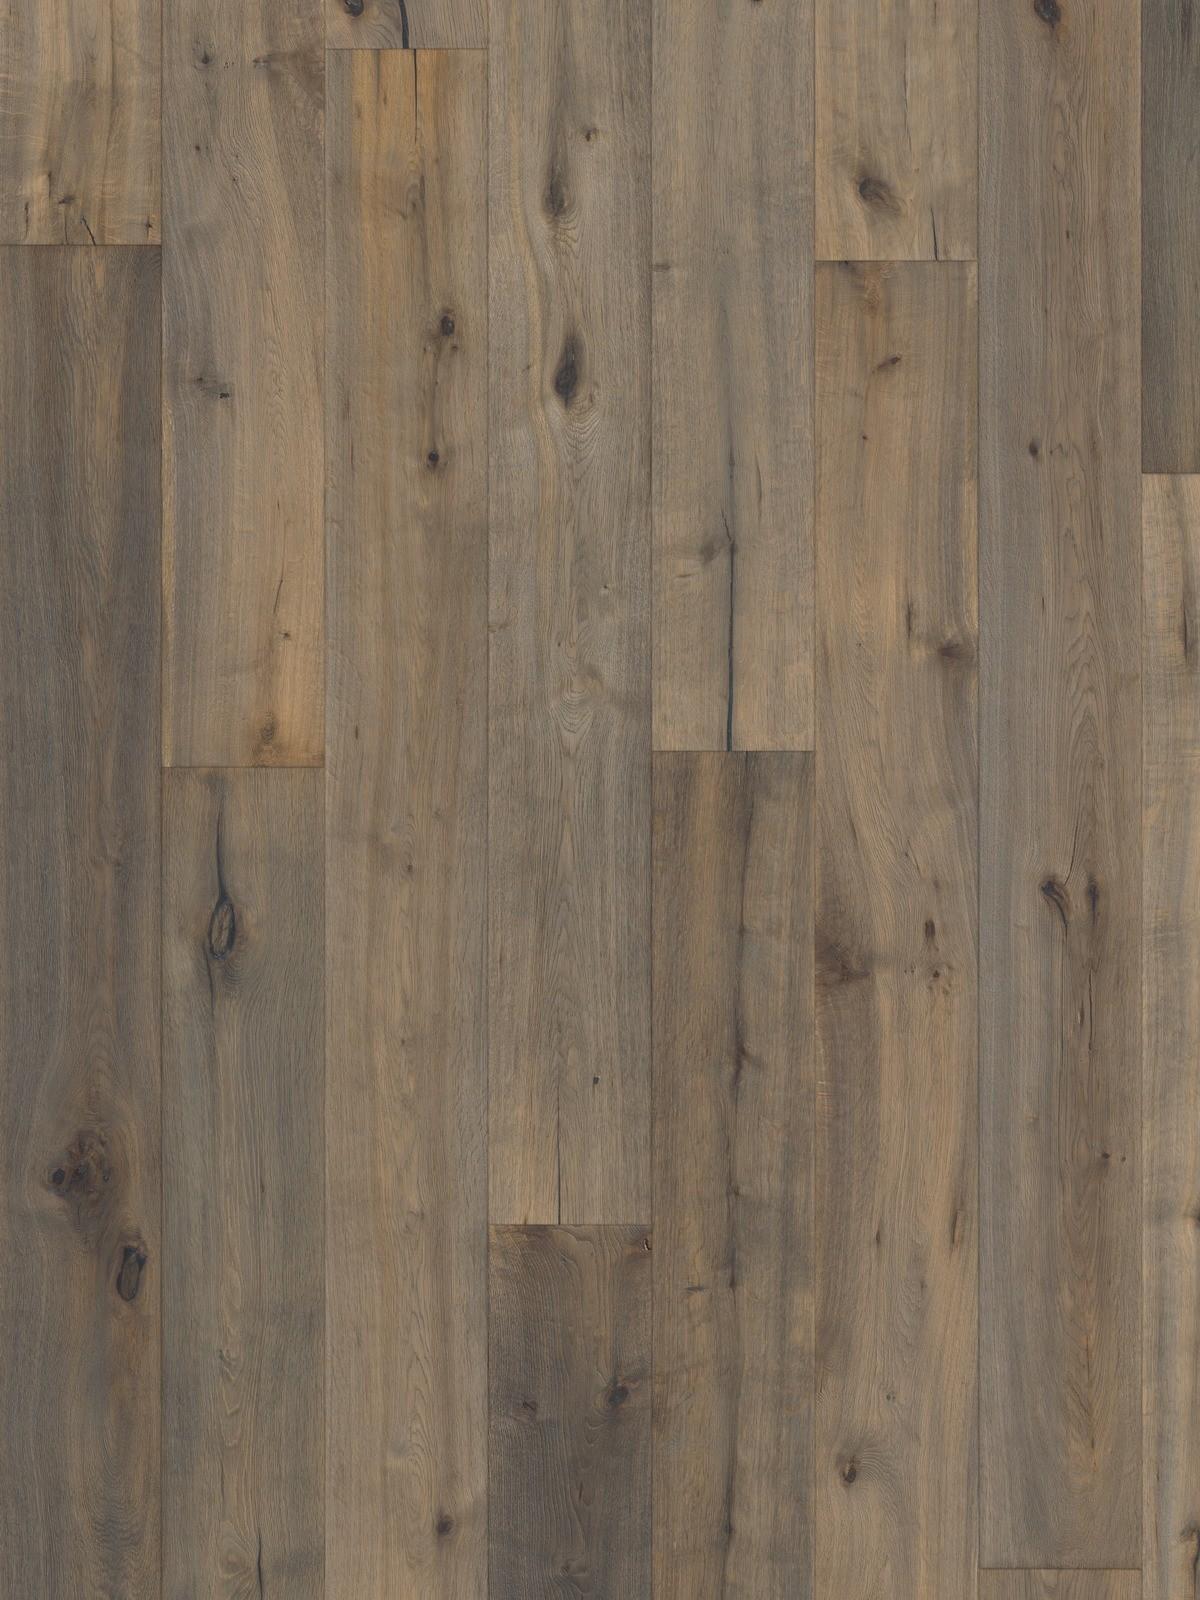 Parchet triplustratificat Stejar Foschia